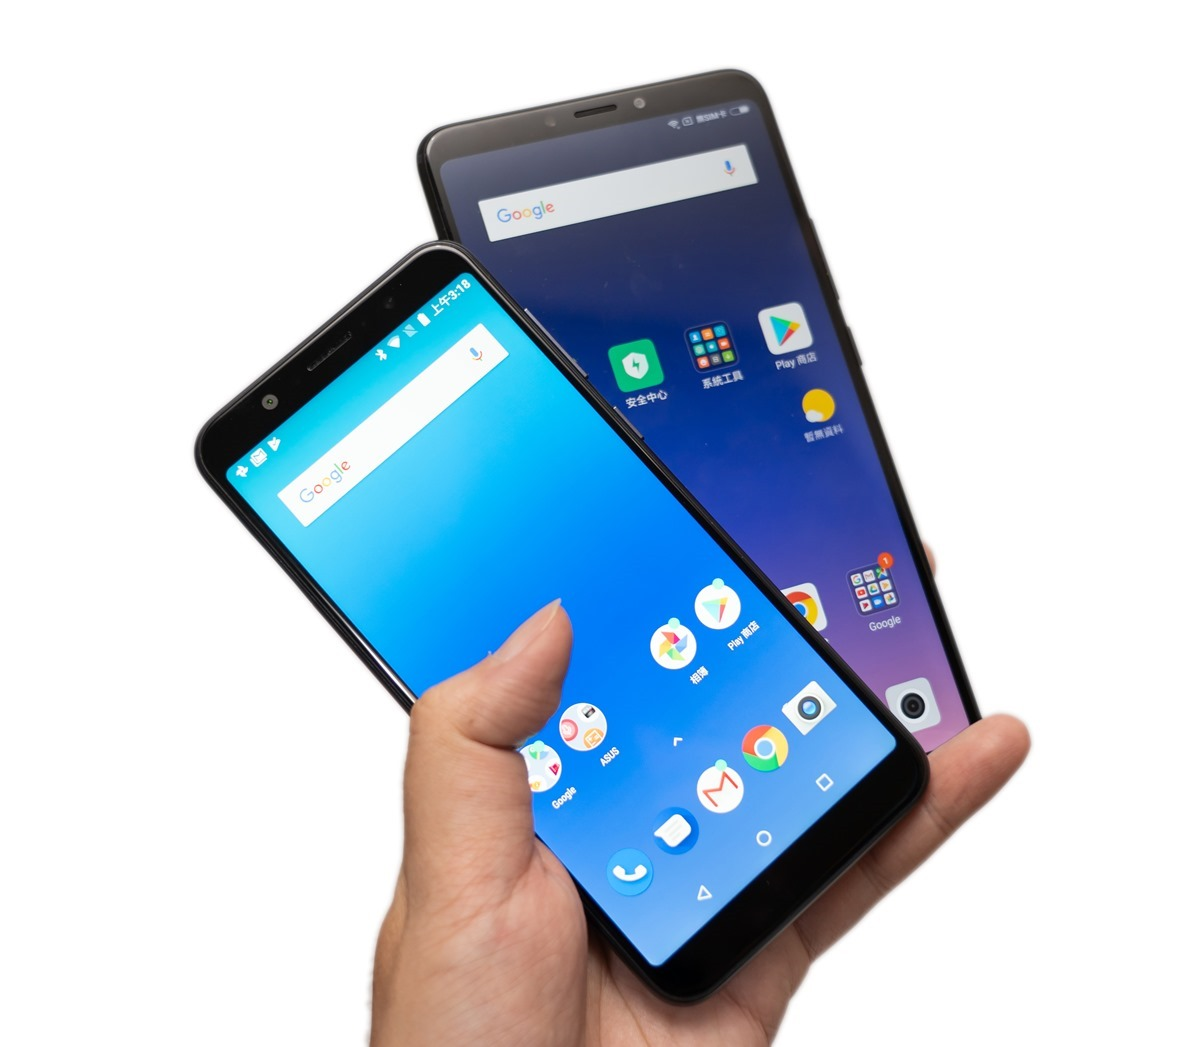 ZenFone MAX Pro 與小米 MAX3 要選那一台?最強電力神機比較 / 對照表 / 電力性能實測 / 分析 @3C 達人廖阿輝